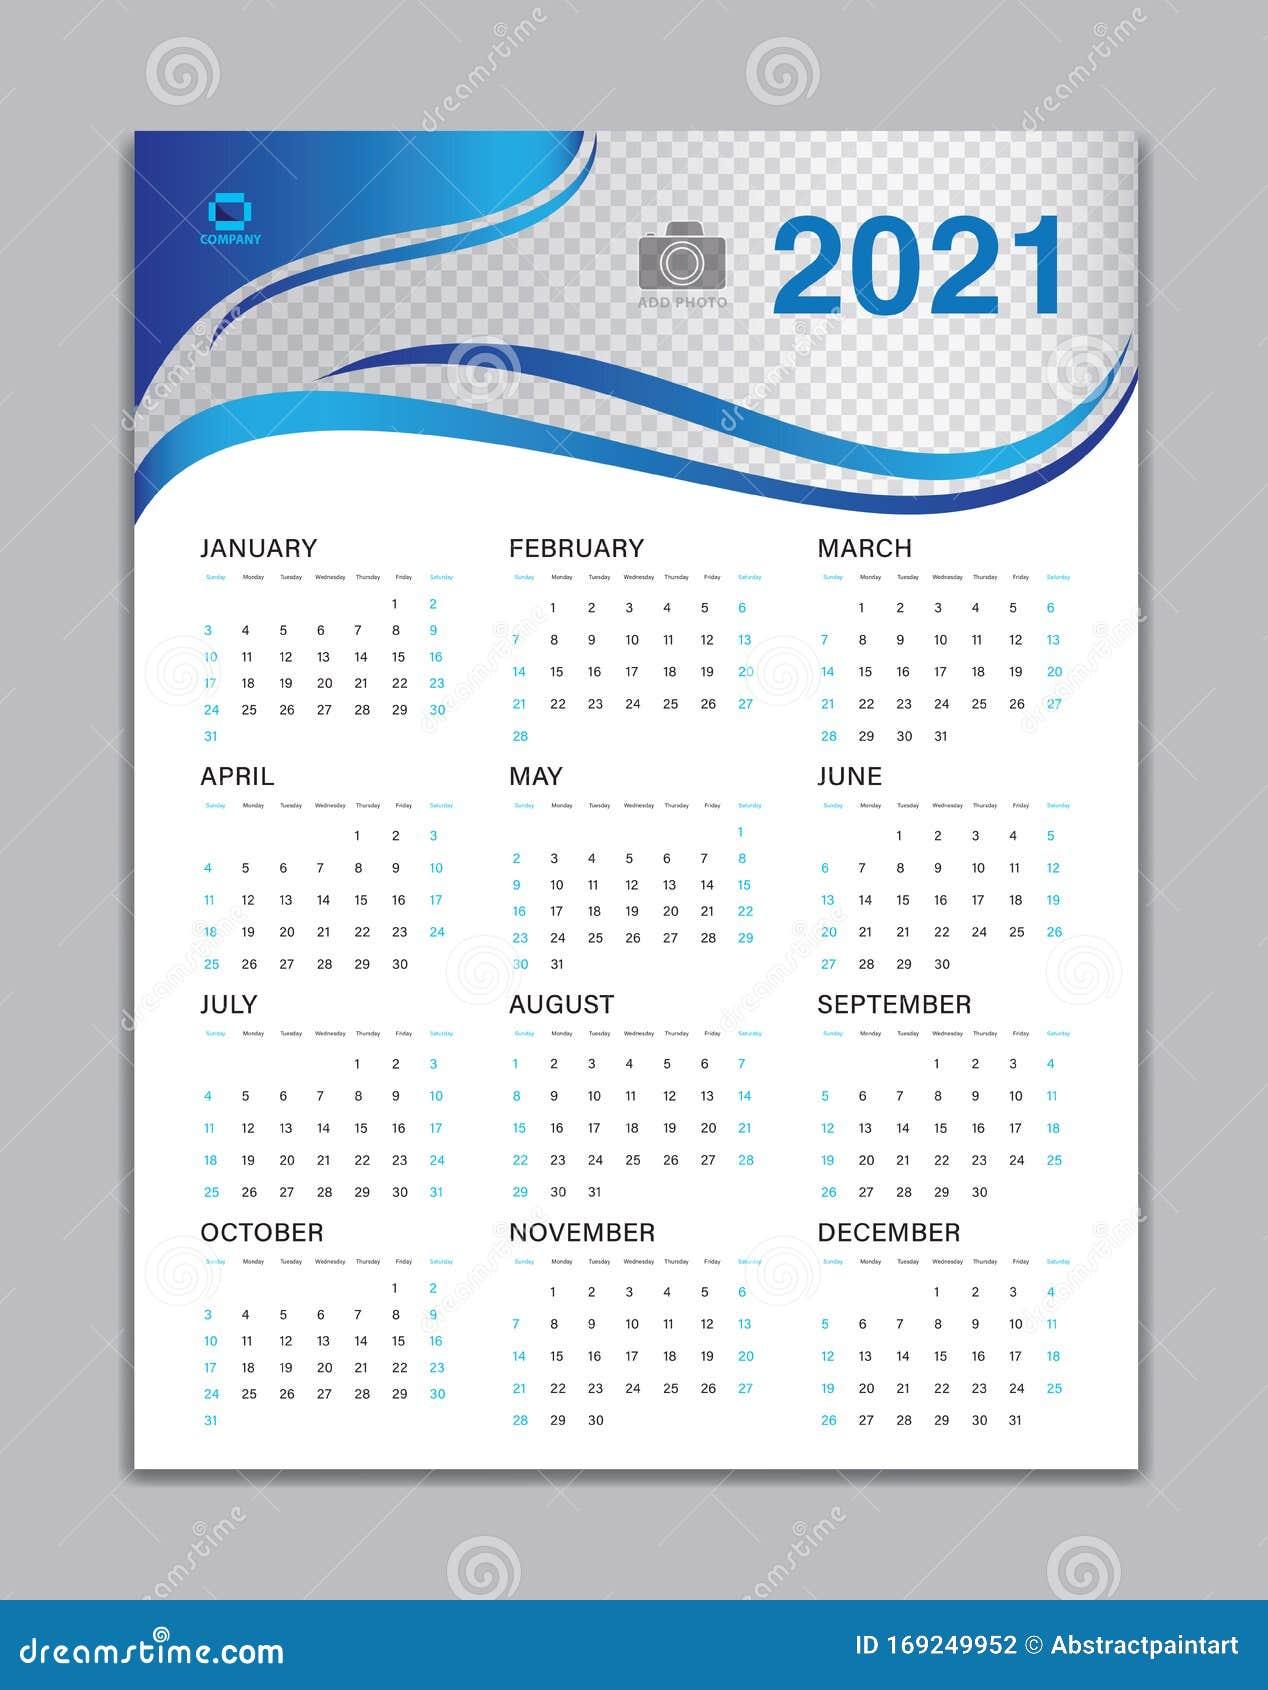 Calendar 2021 Template, Wall Calendar 2021 Vector, Desk ...